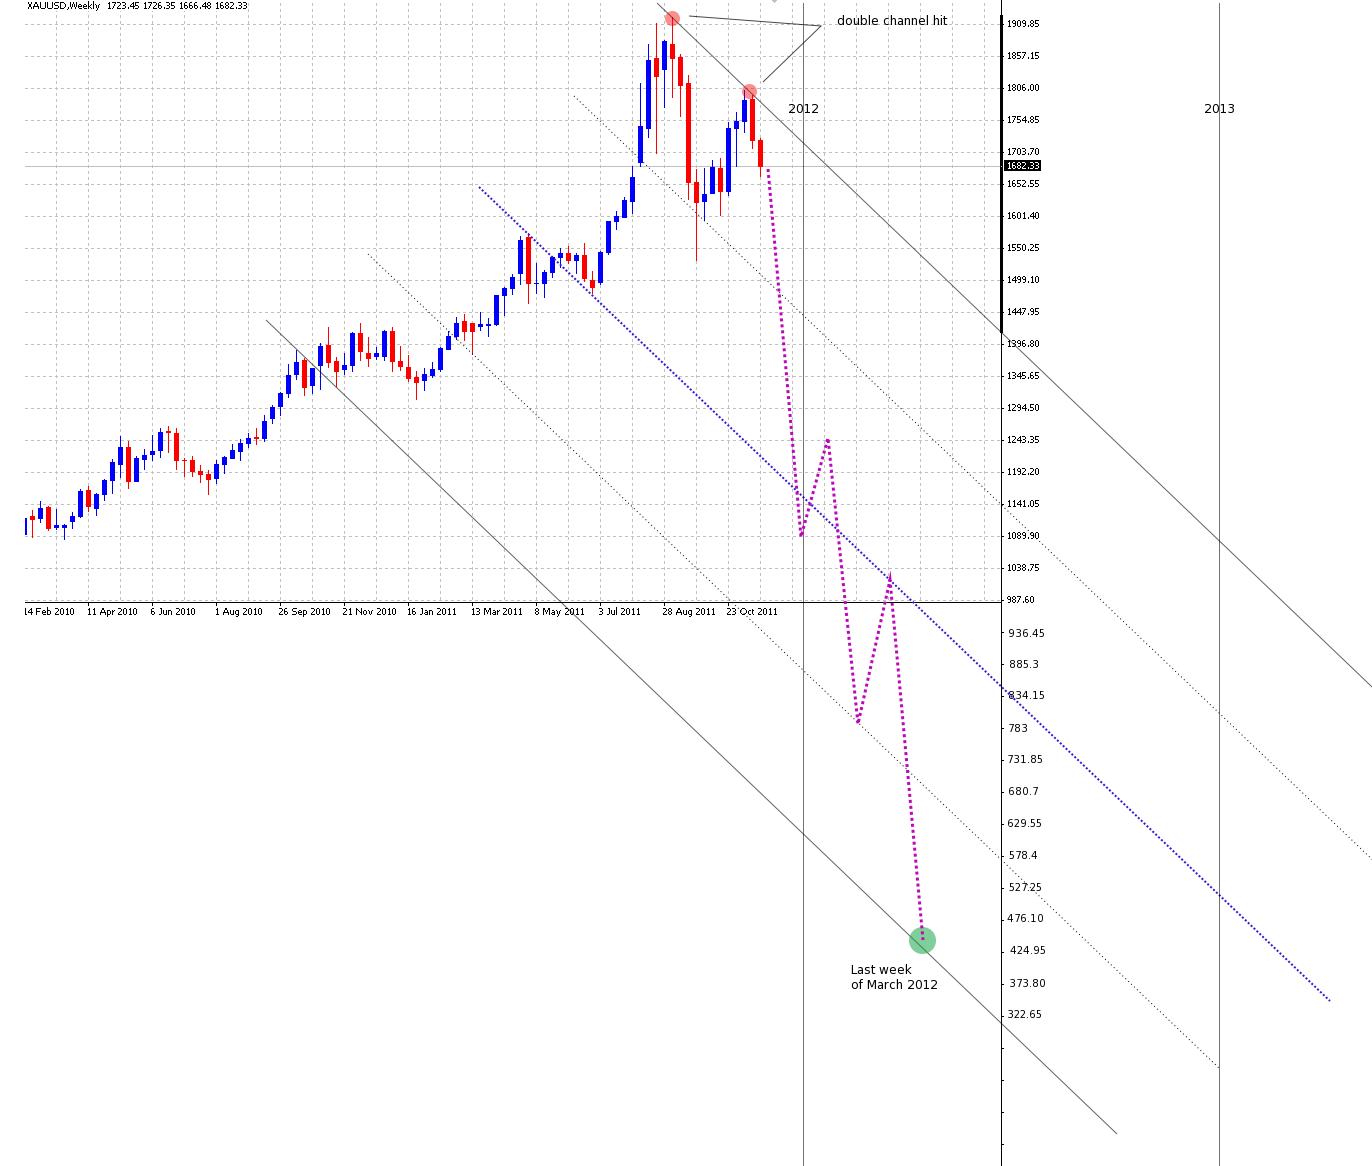 Gold crash to 430